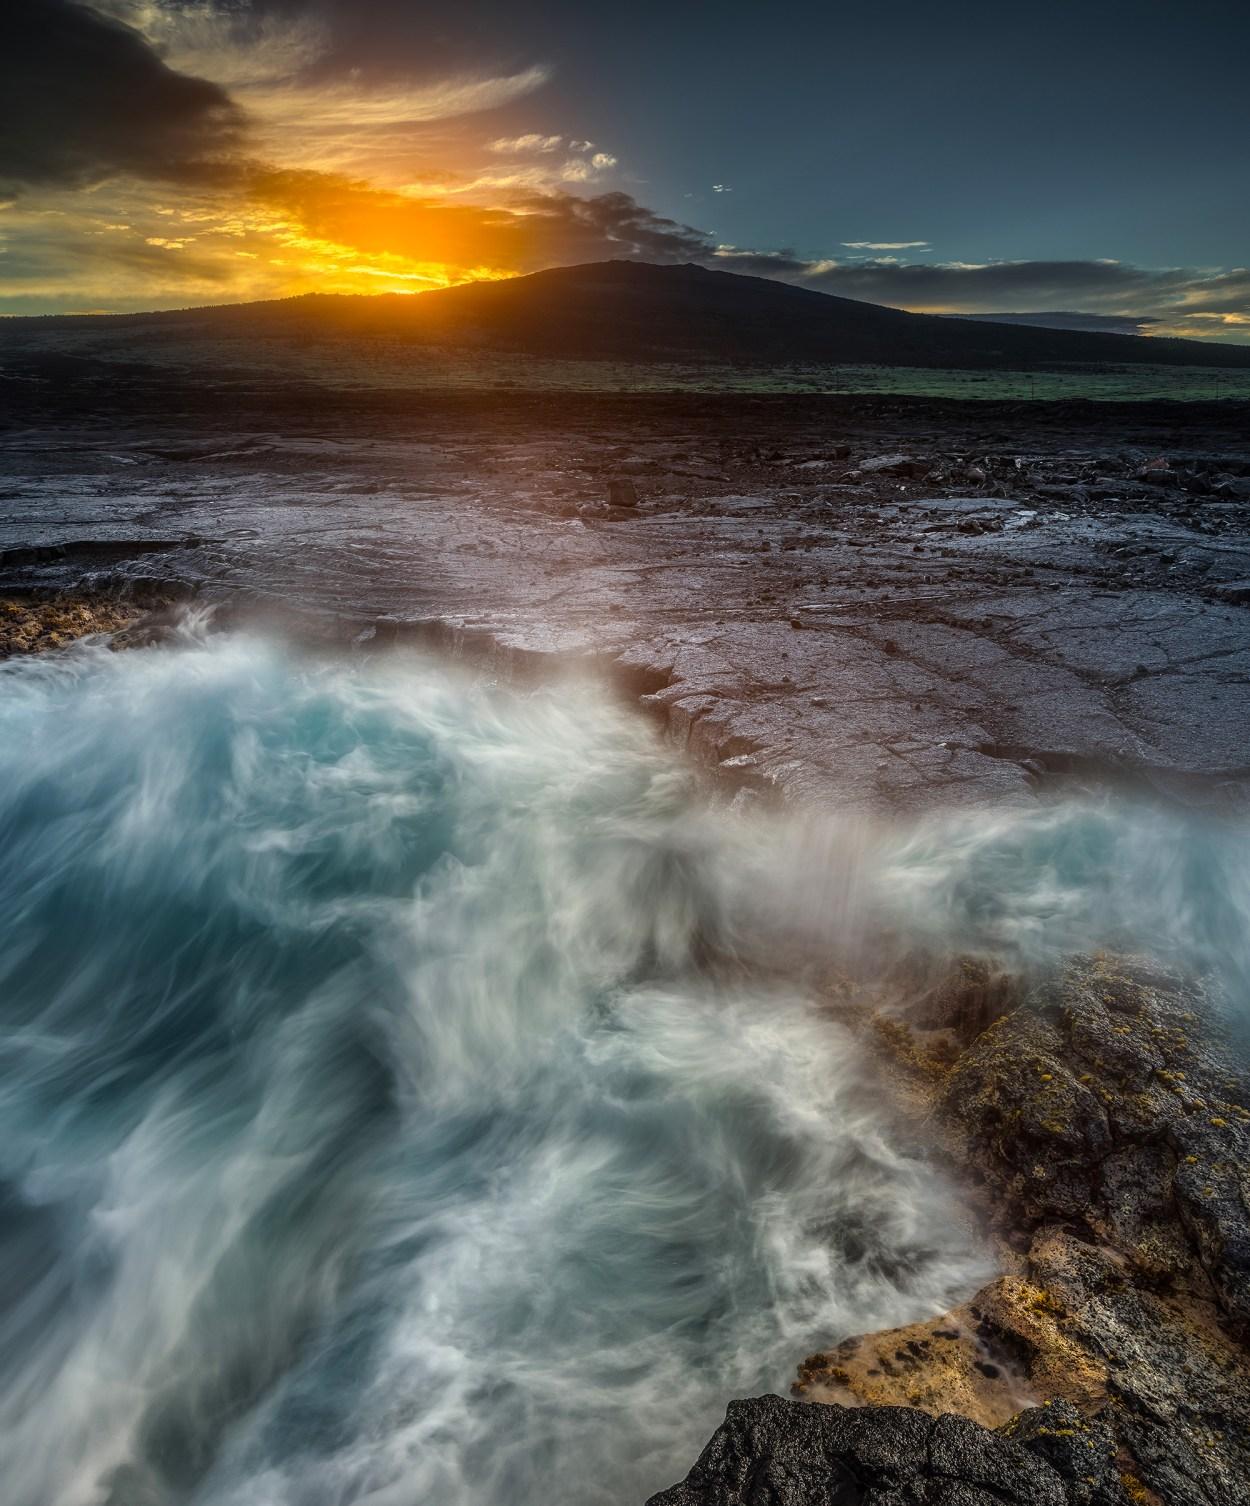 Hawaii's Rugged Beaches by Photographer Jason Wright